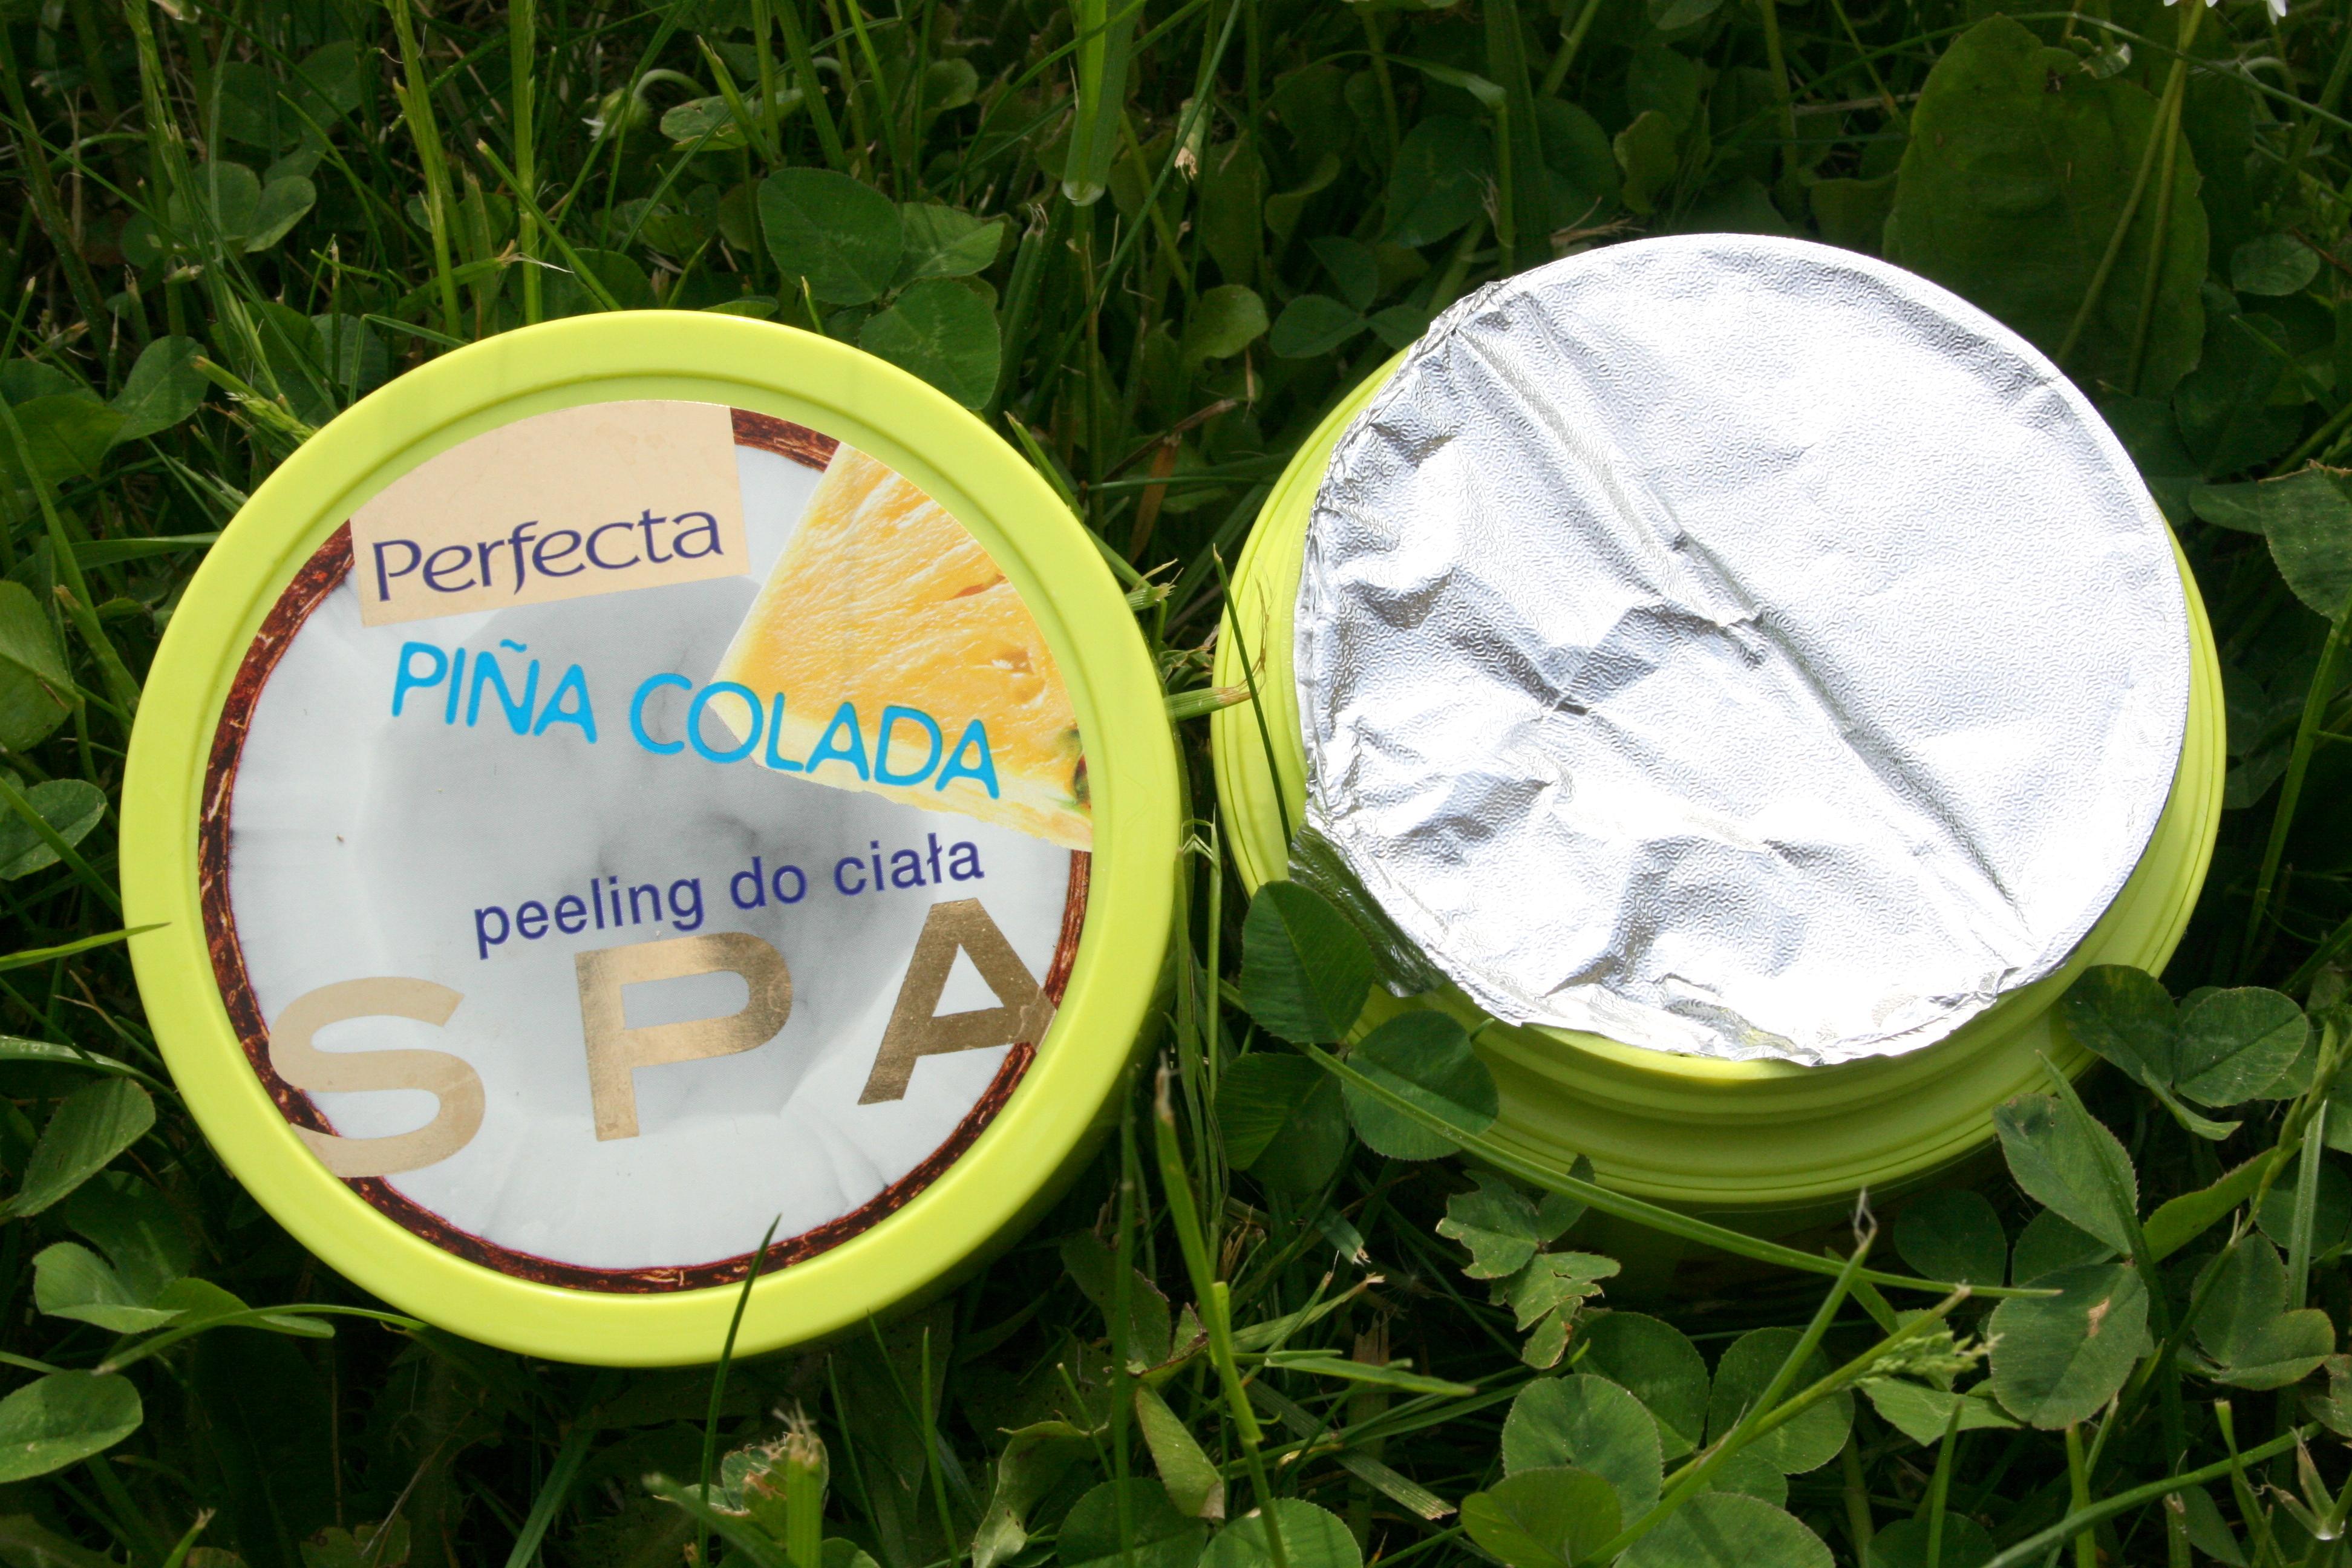 antycelulitowy peeling do ciała Pina Colada Perfecta SPA